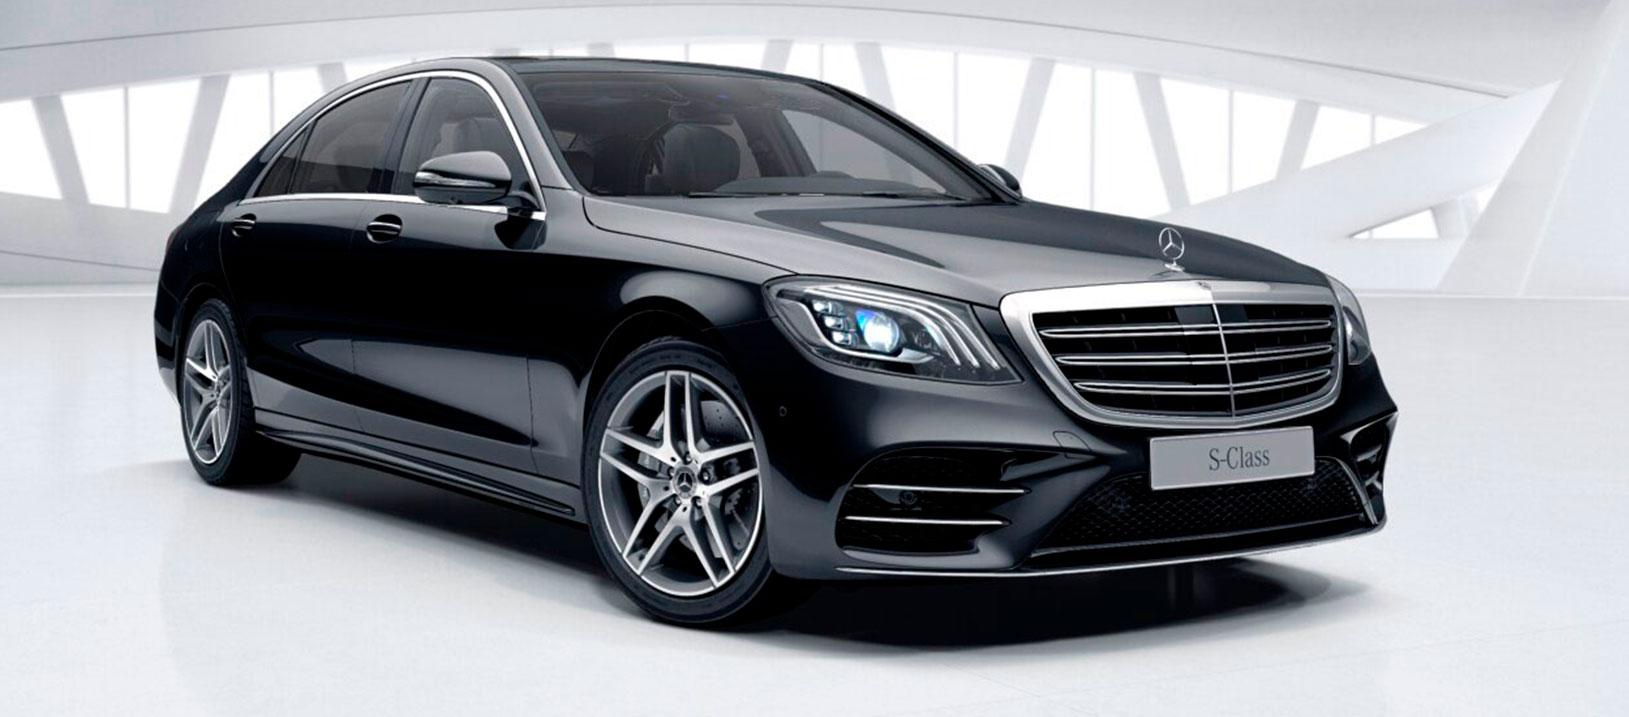 Mercedes-Benz S 560 d 4MATIC long 52600187